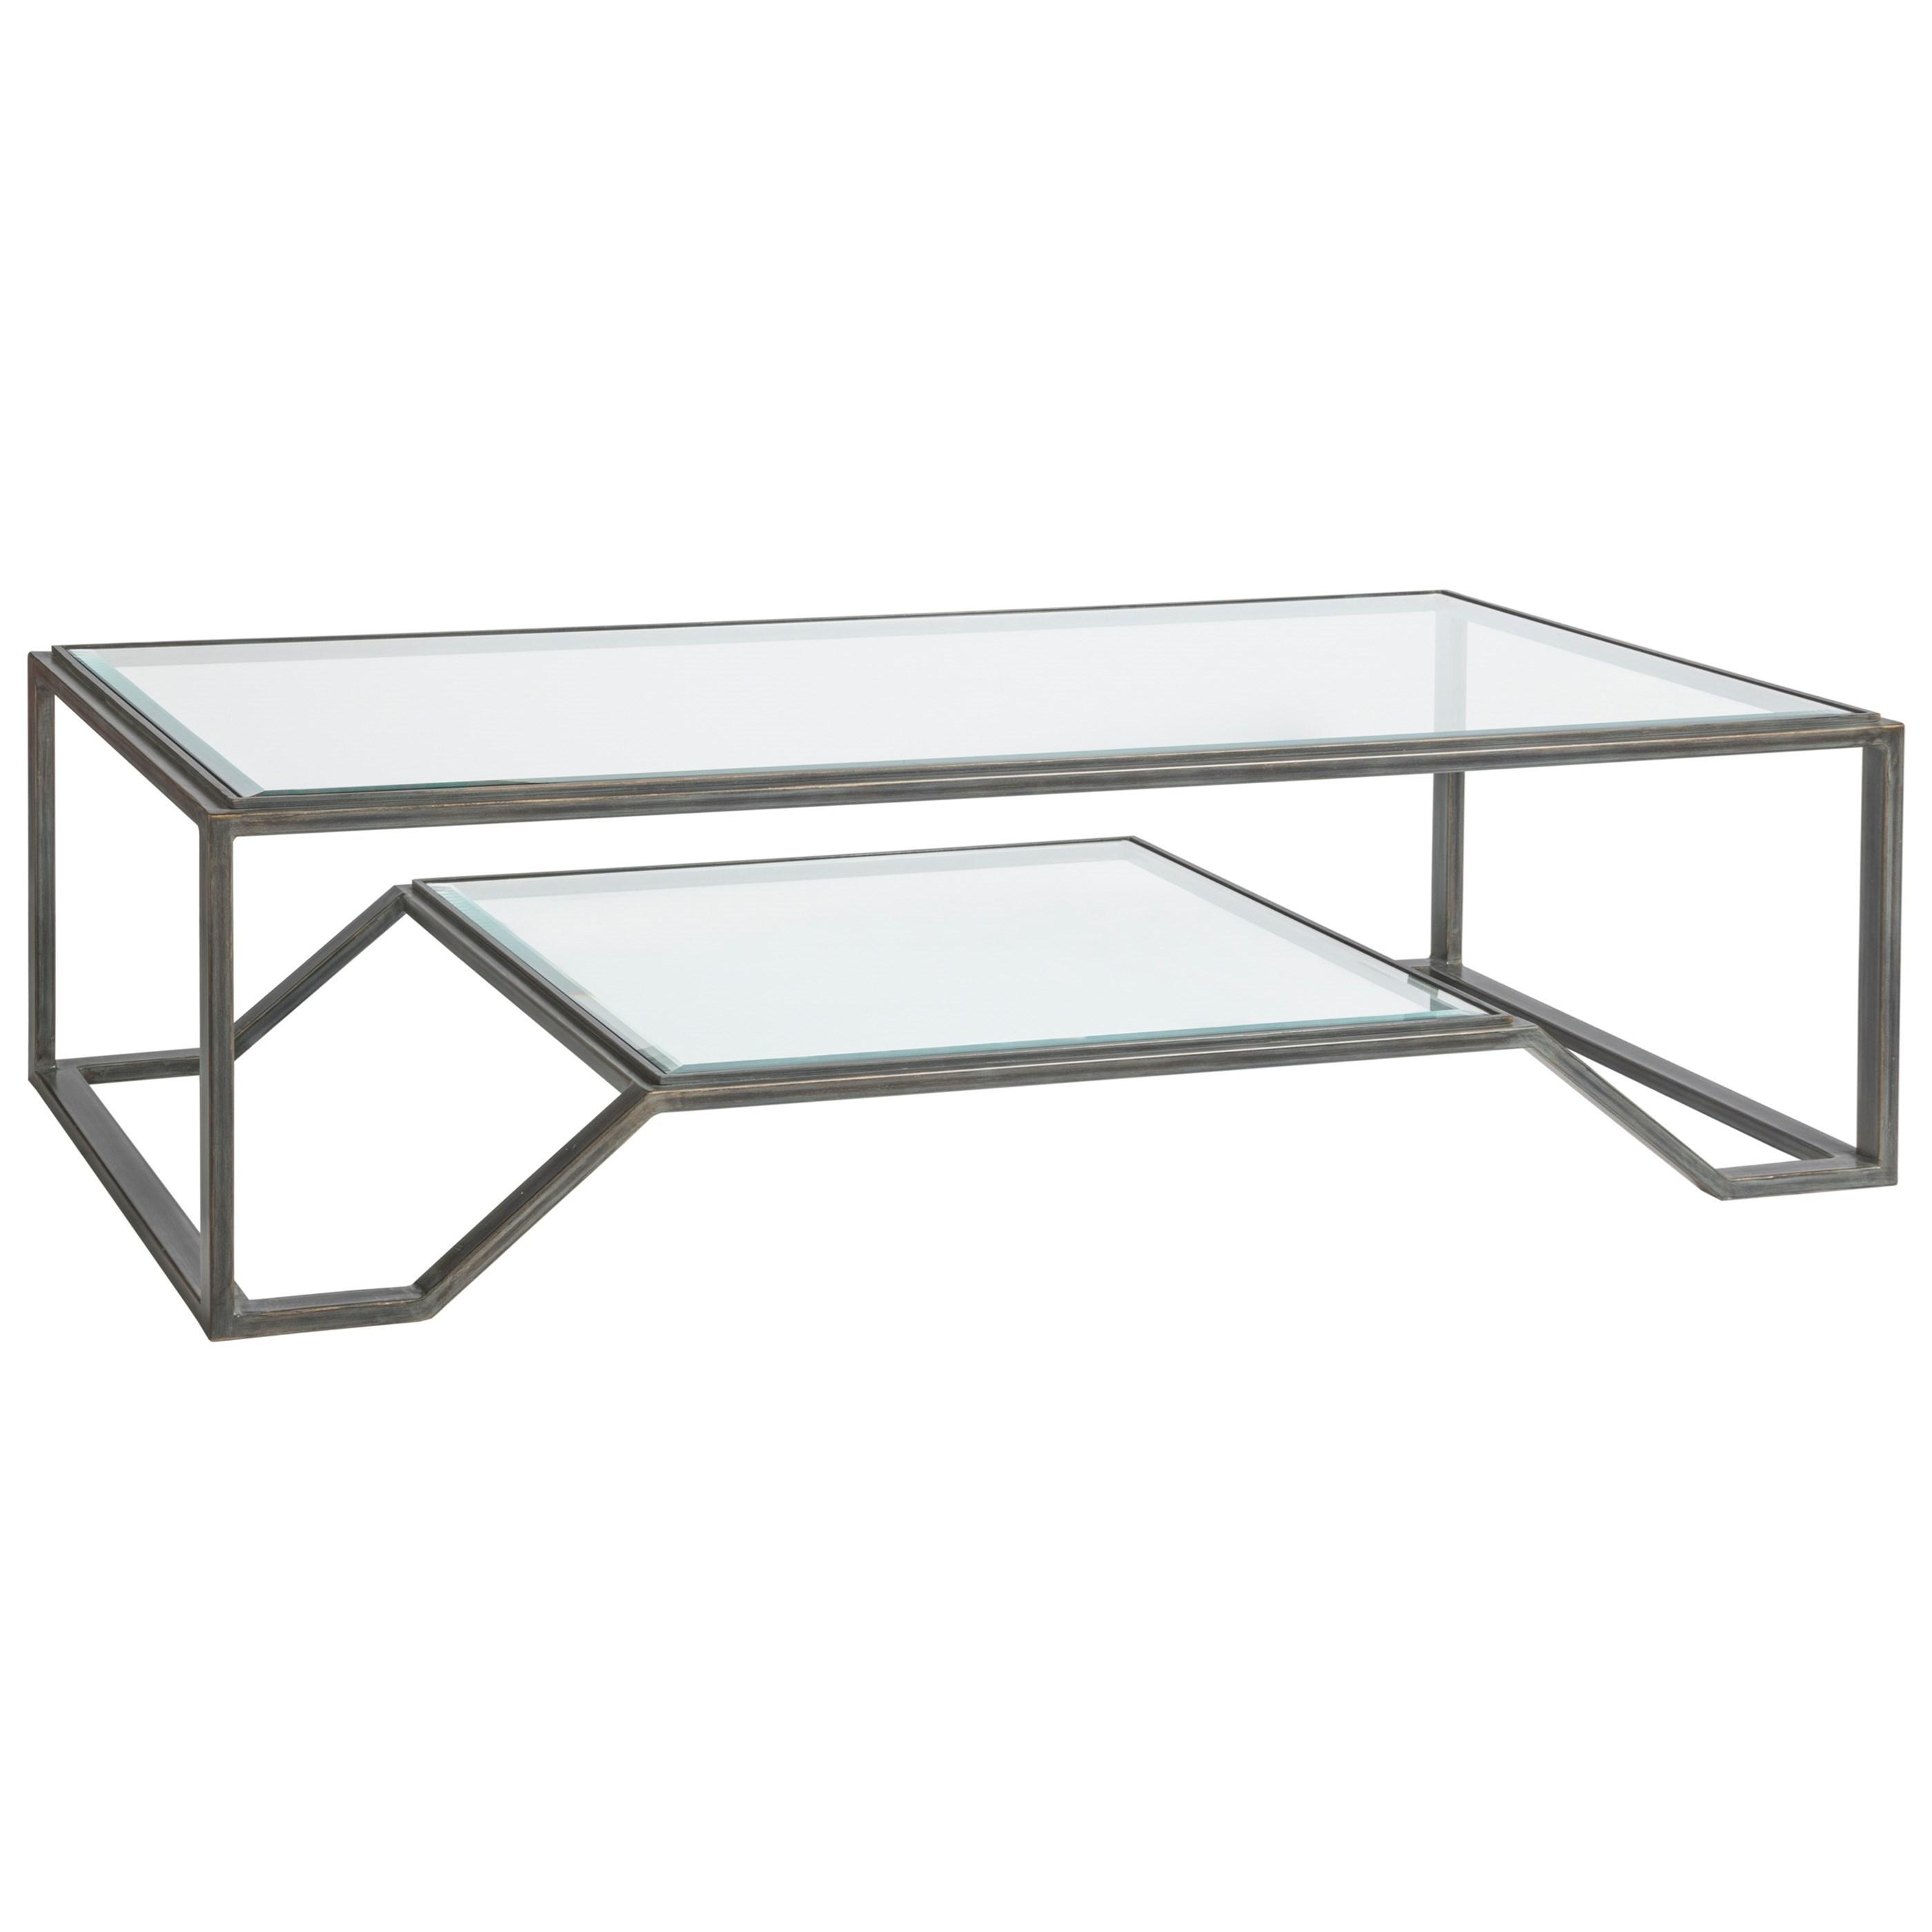 Metal Designs Byron Rectangular Cocktail Table by Artistica at Sprintz Furniture